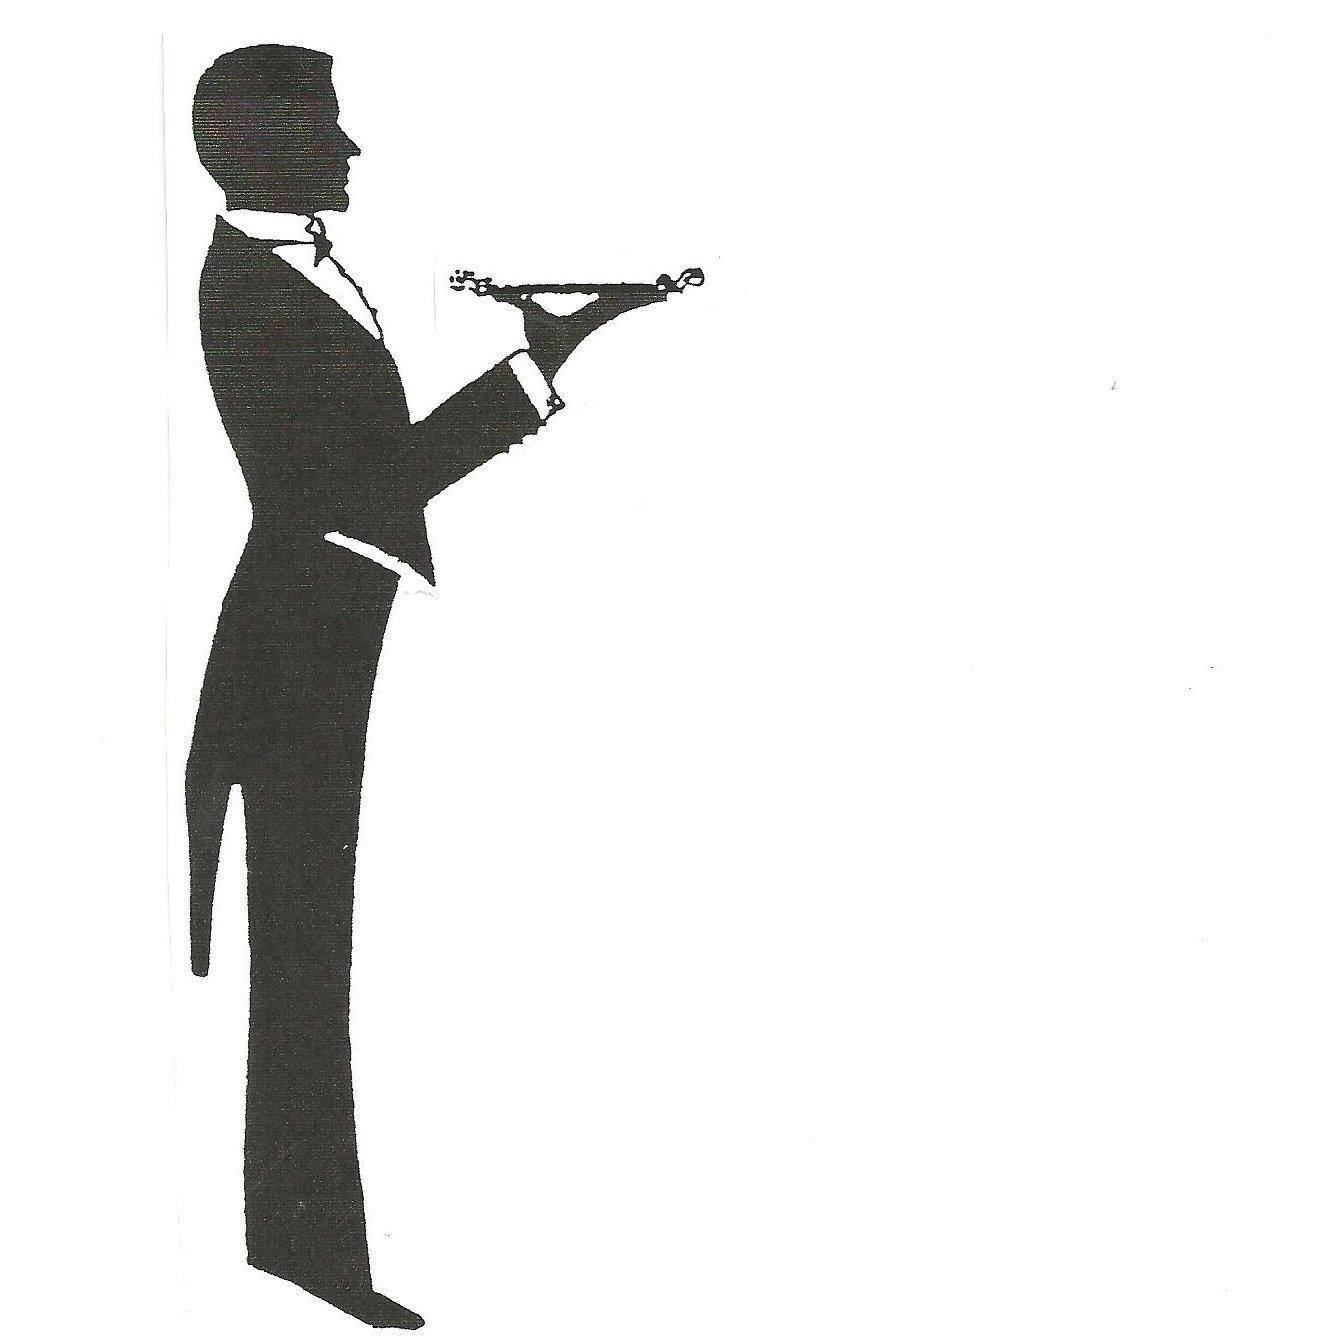 Cole Men's Wear and Tuxedos - Gardena, CA - Formal Wear